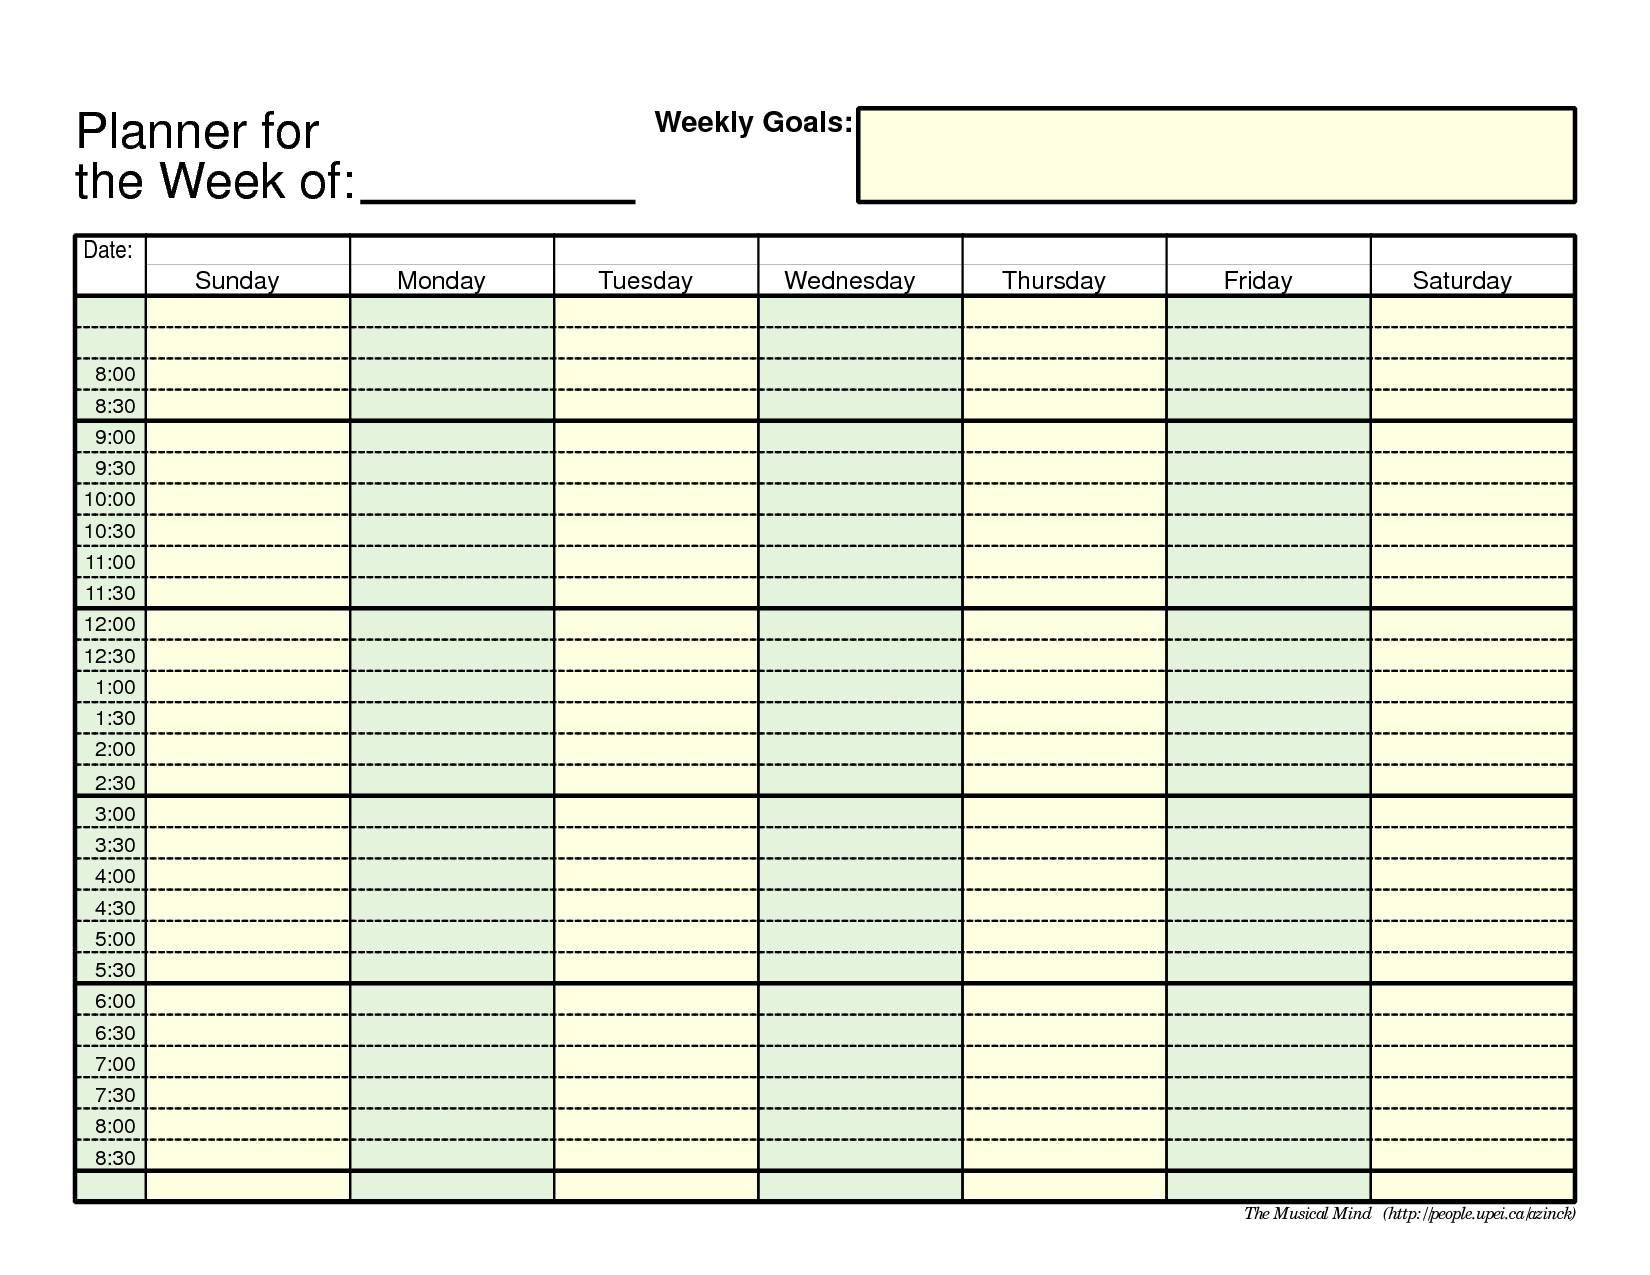 Weekly Planner Template Image 3 Craft Ideas Pinterest Planner